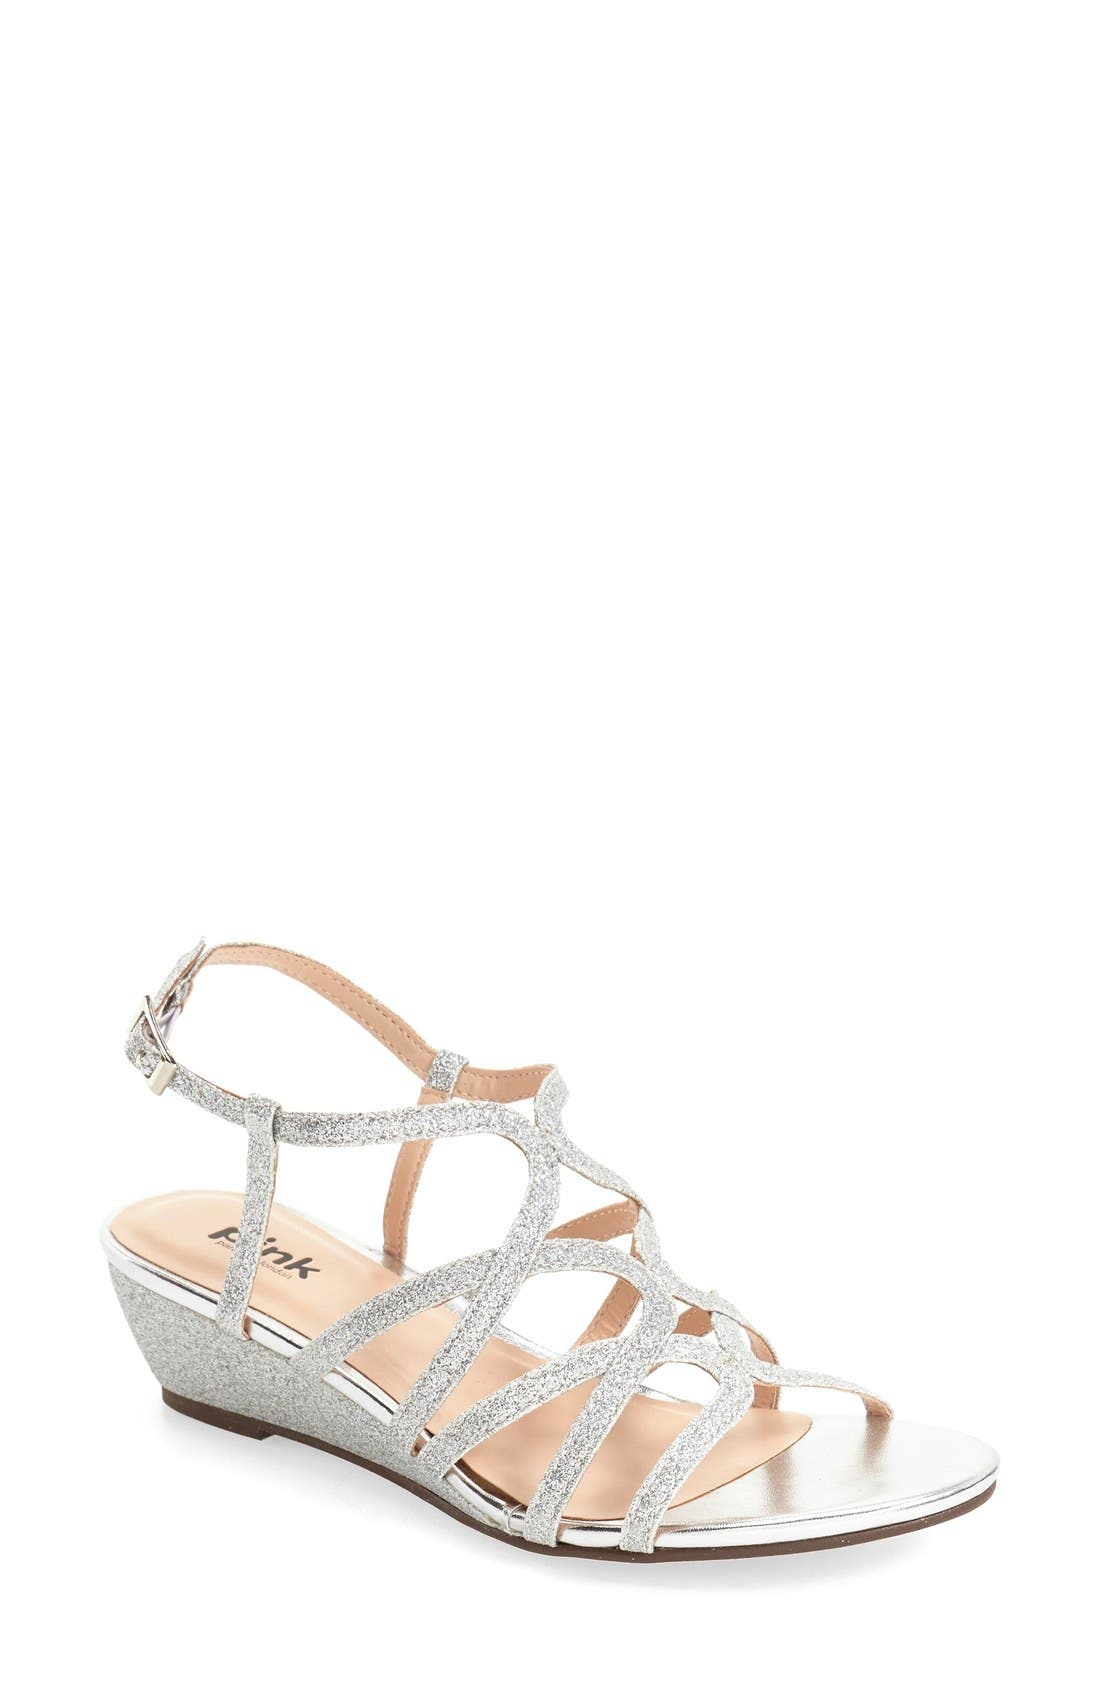 'Opulent' Wedge Sandal,                         Main,                         color, 040